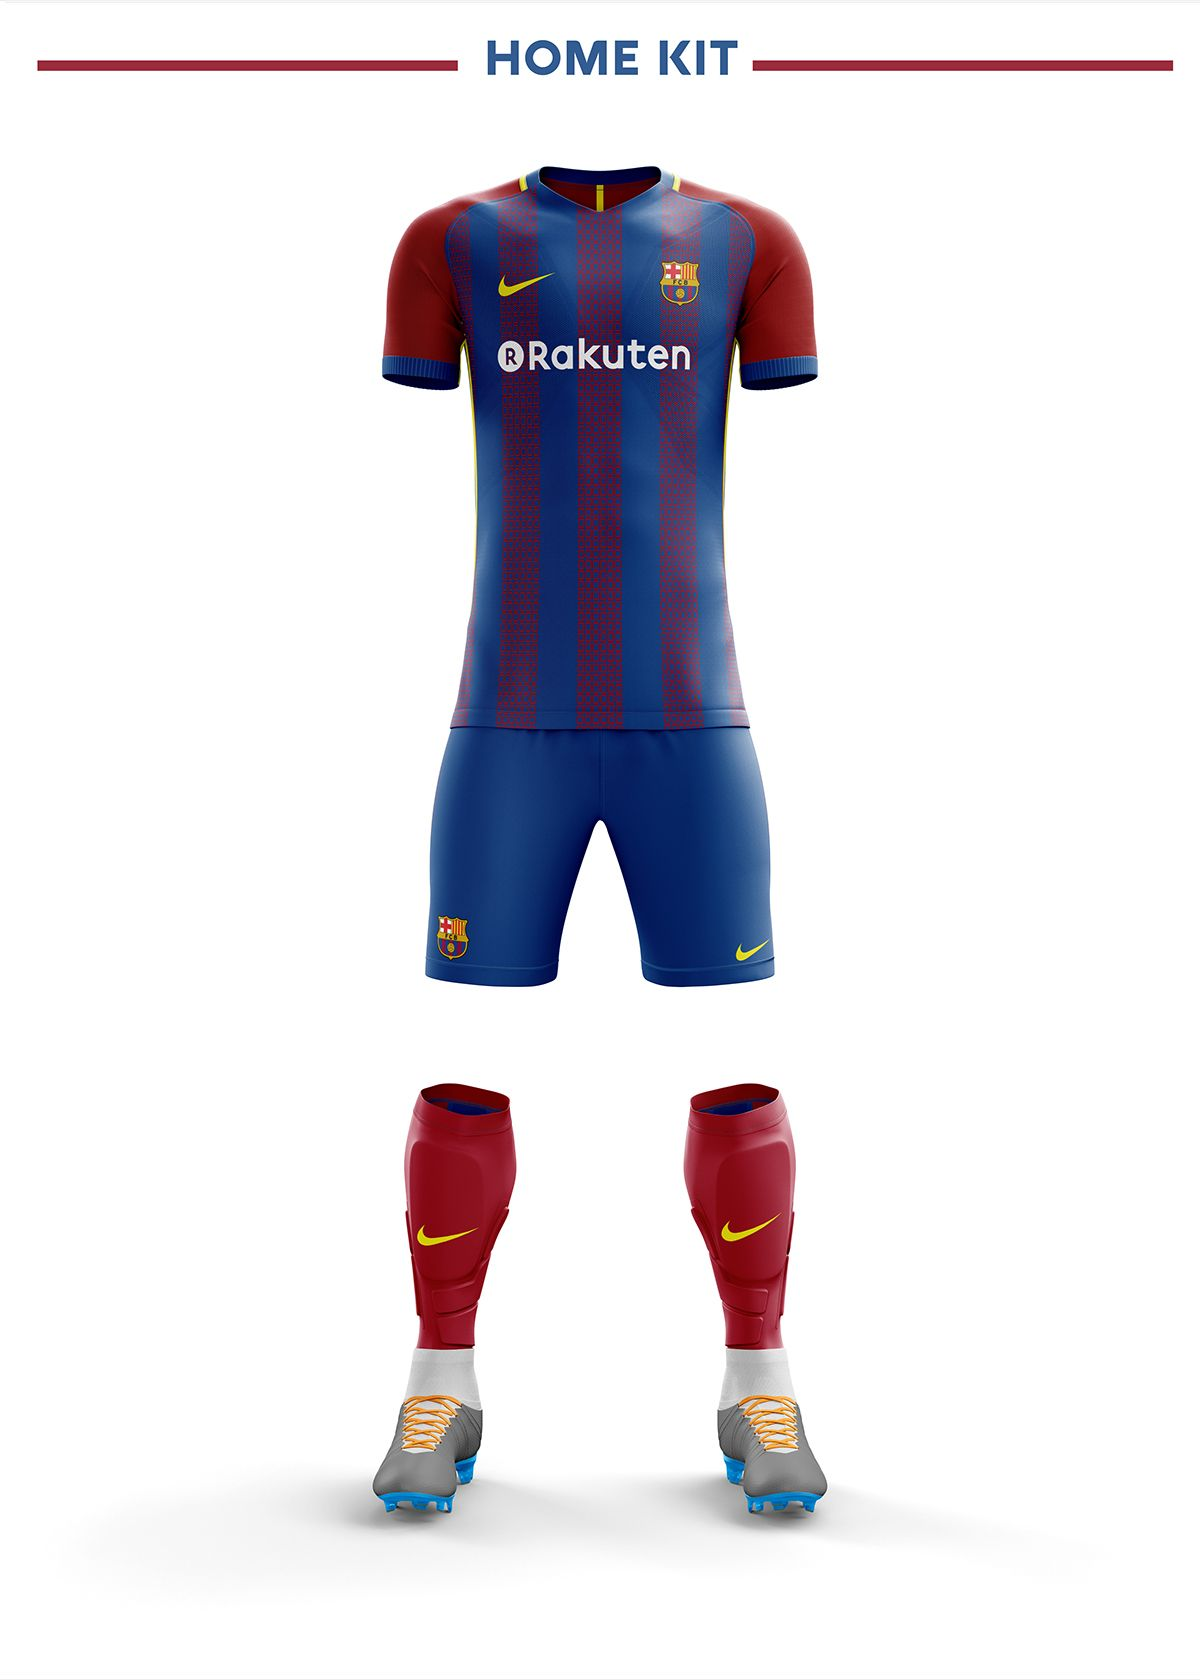 Fc Barcelona Football Kit 18 19. on Behance  045e9db1b4d29